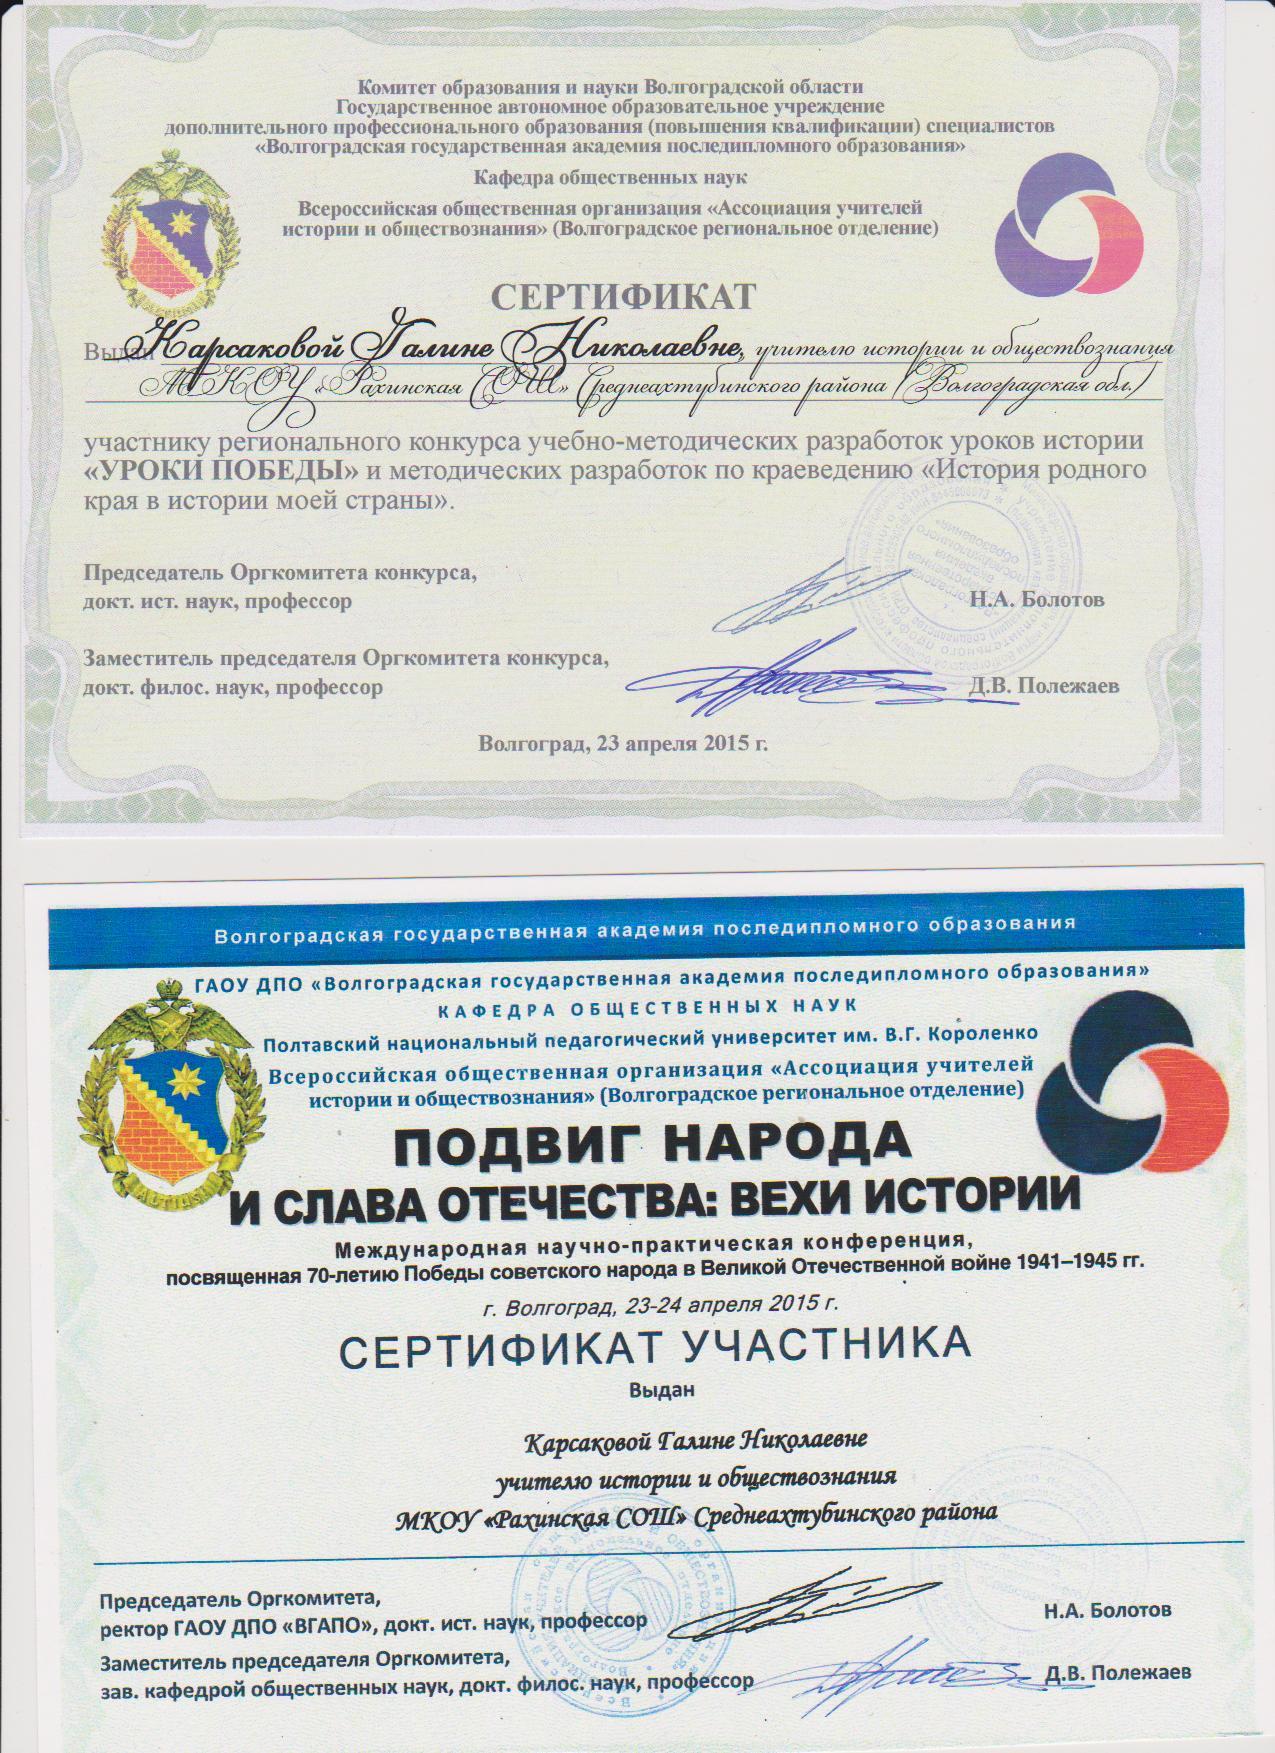 C:\Documents and Settings\User\Рабочий стол\счет 001.jpg